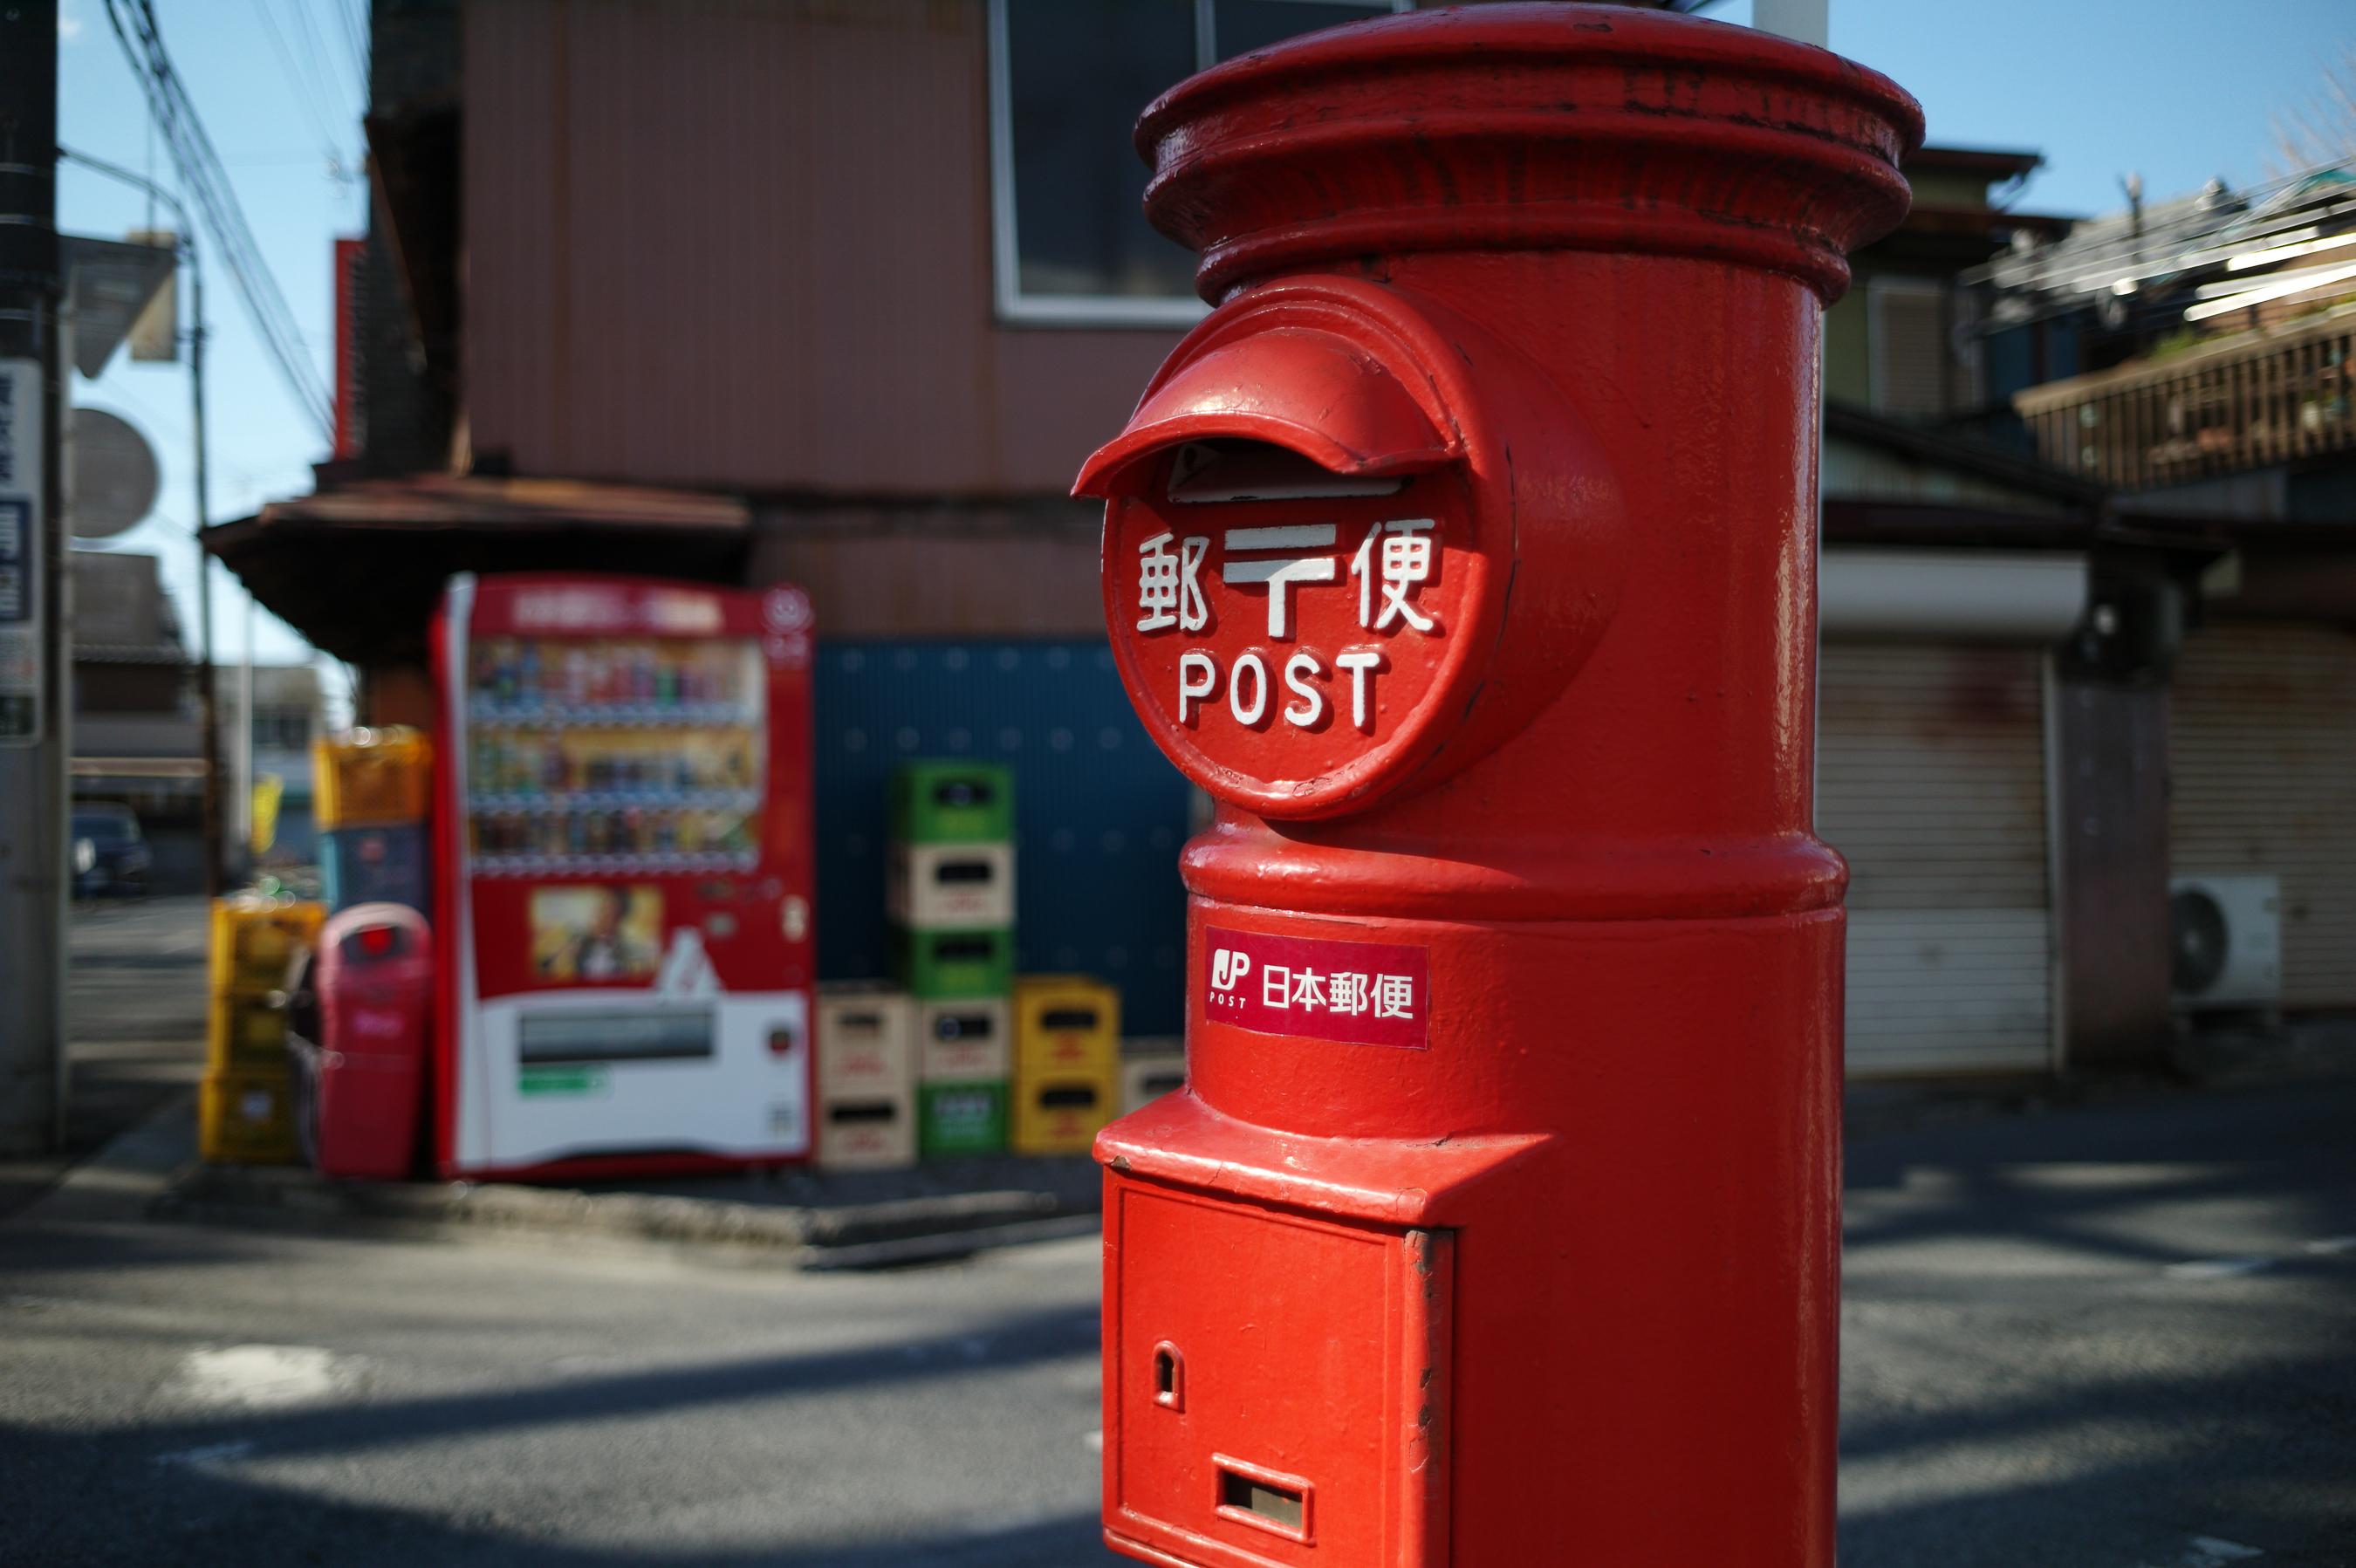 f:id:aoyama-takuro:20180212011706j:plain